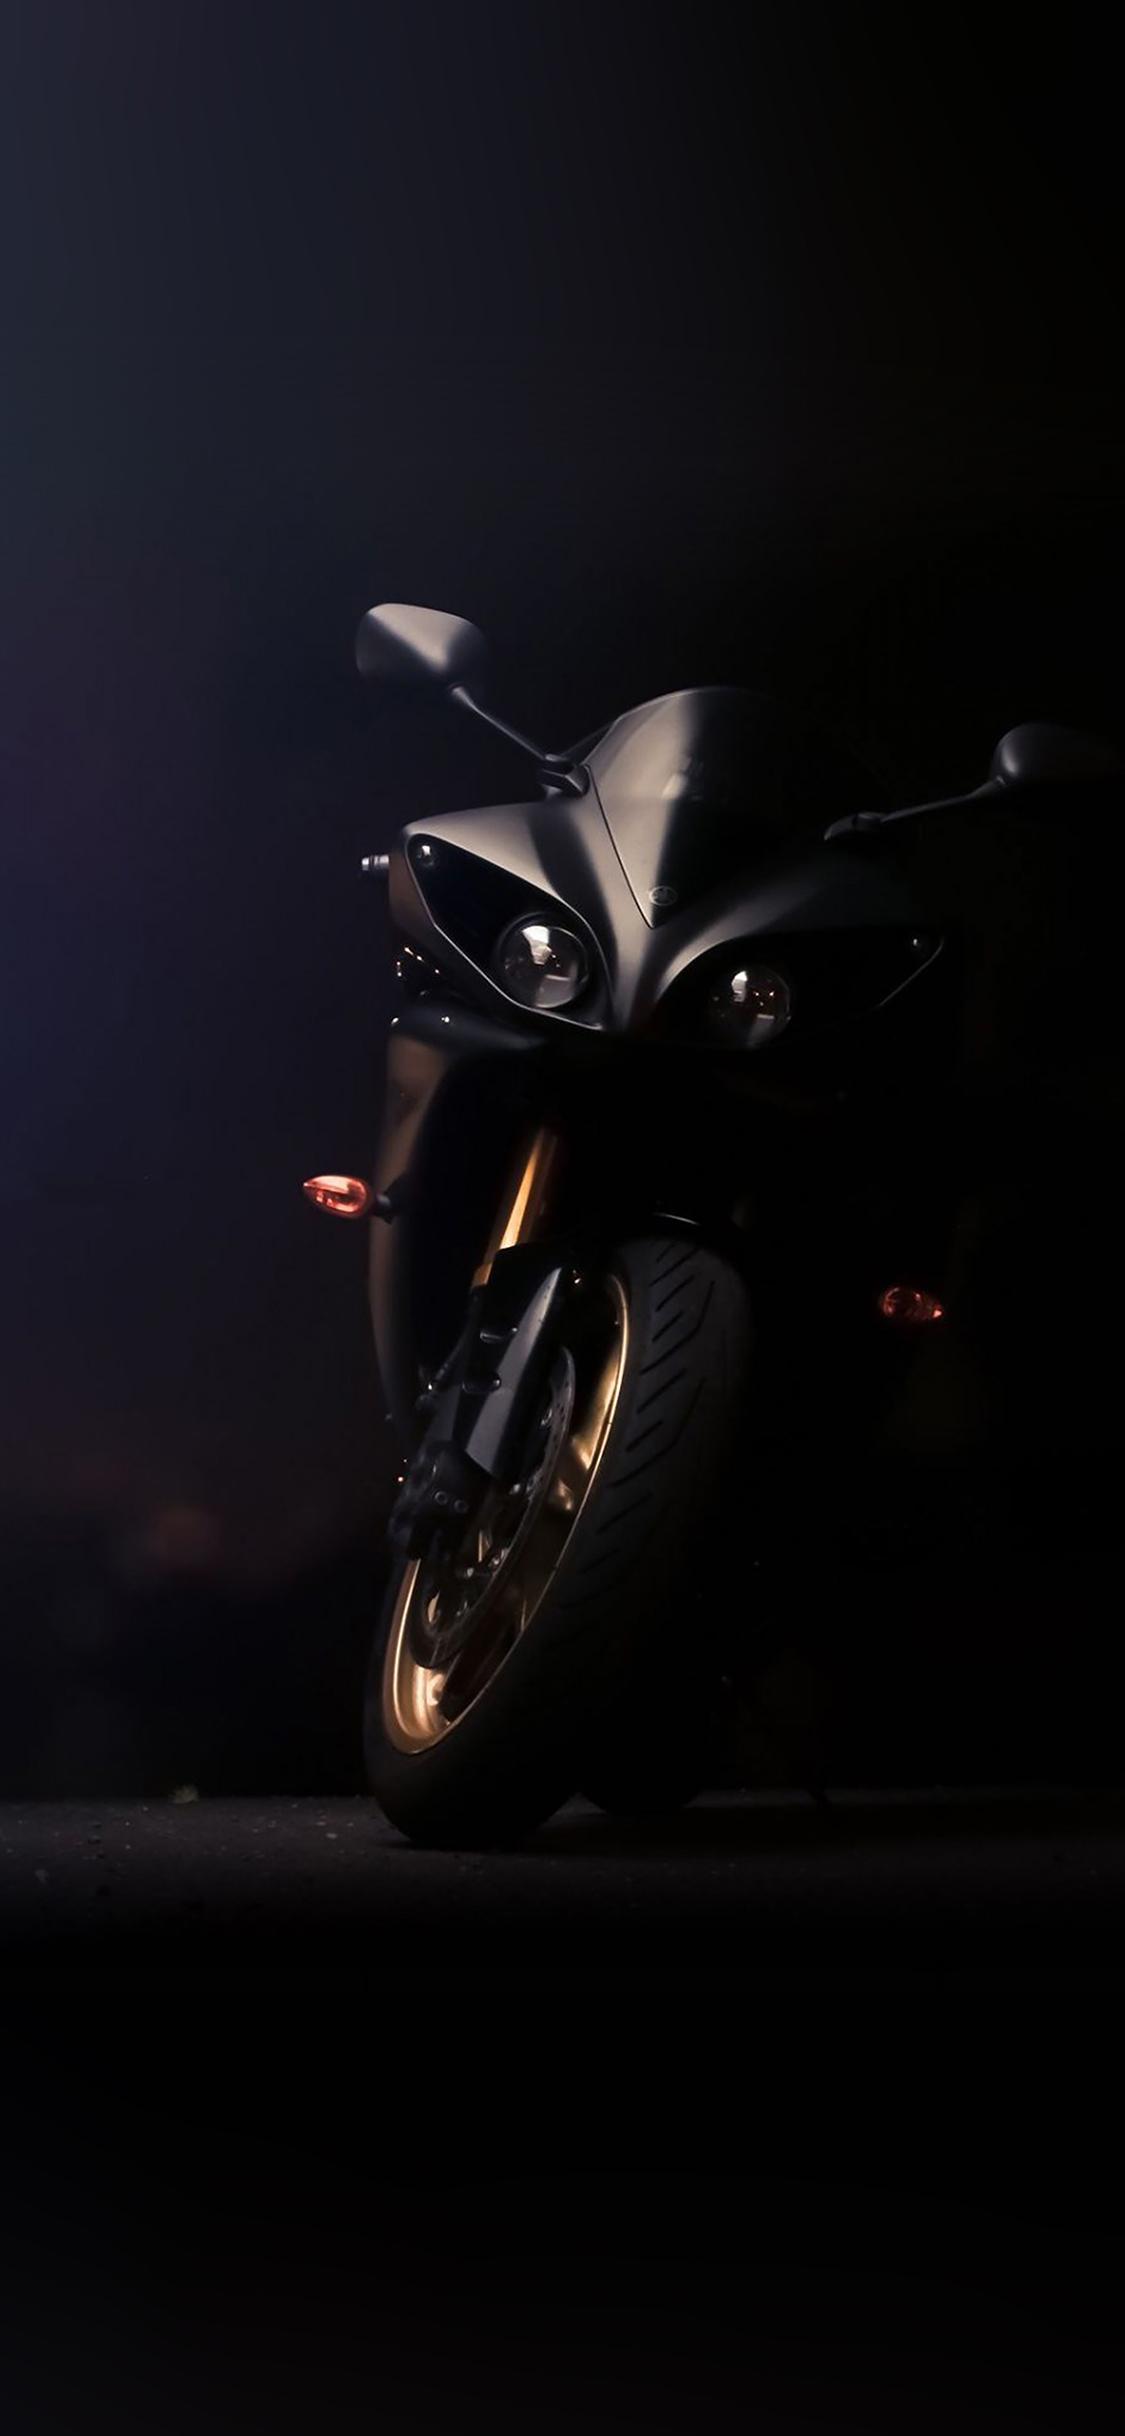 Af47 Yamaha Ride Motorbike Wallpaper